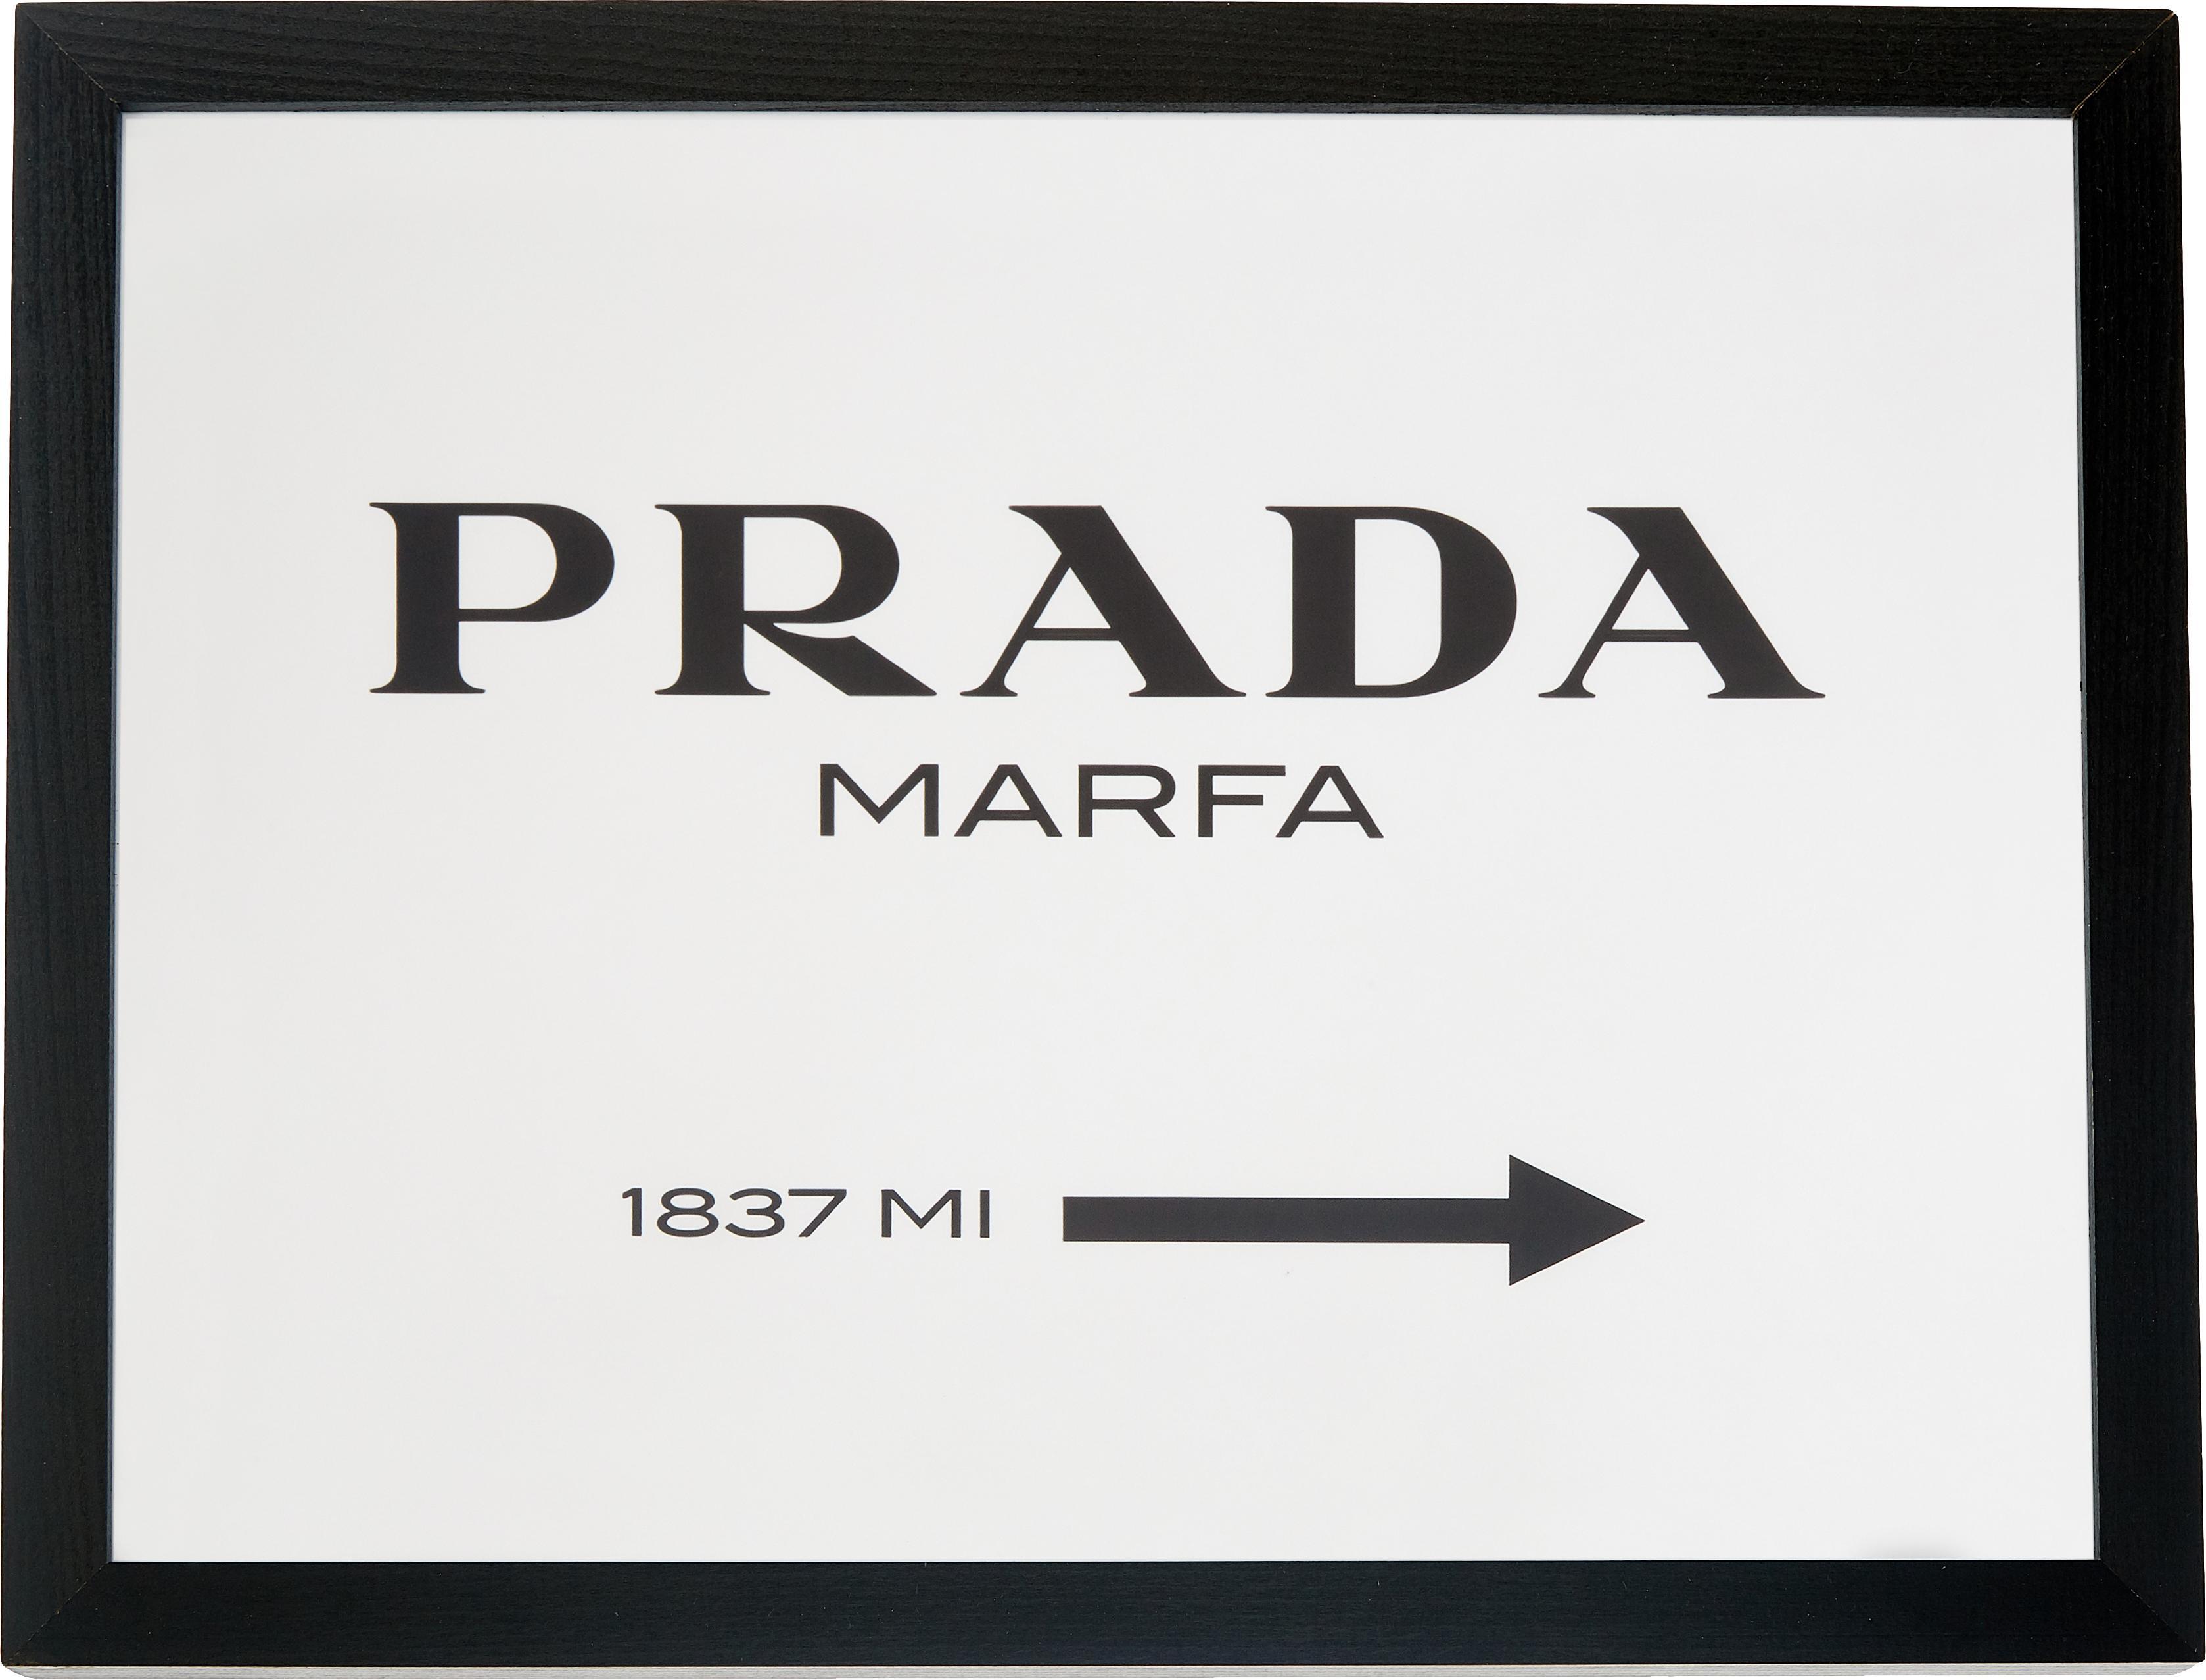 Ingelijste digitale print Prada Marfa, Afbeelding: digitale print op papier,, Lijst: gelakt hout, Zwart, wit, 43 x 33 cm